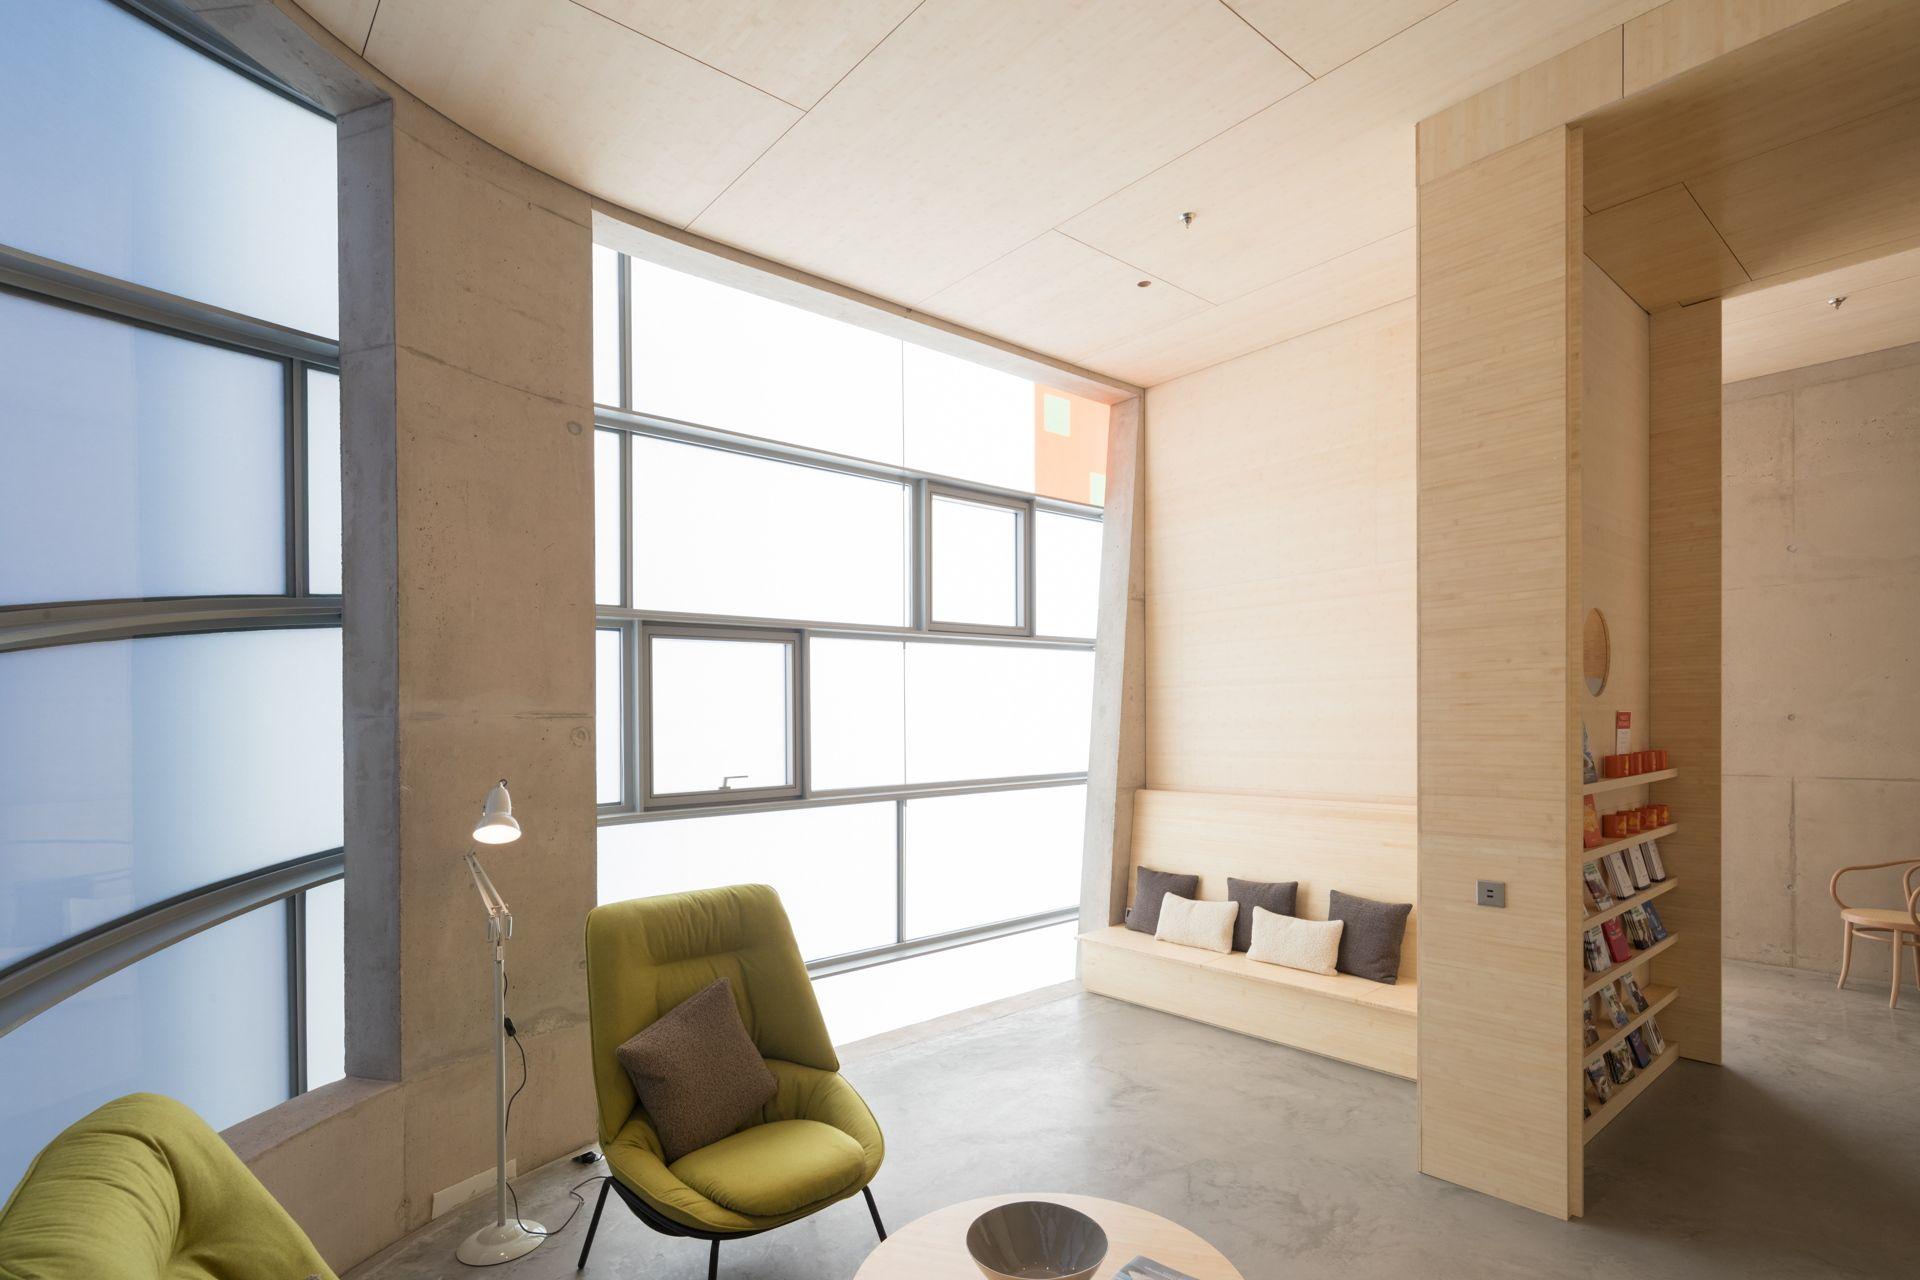 Steven Holl jmarchitects Maggie's Centre Barts London